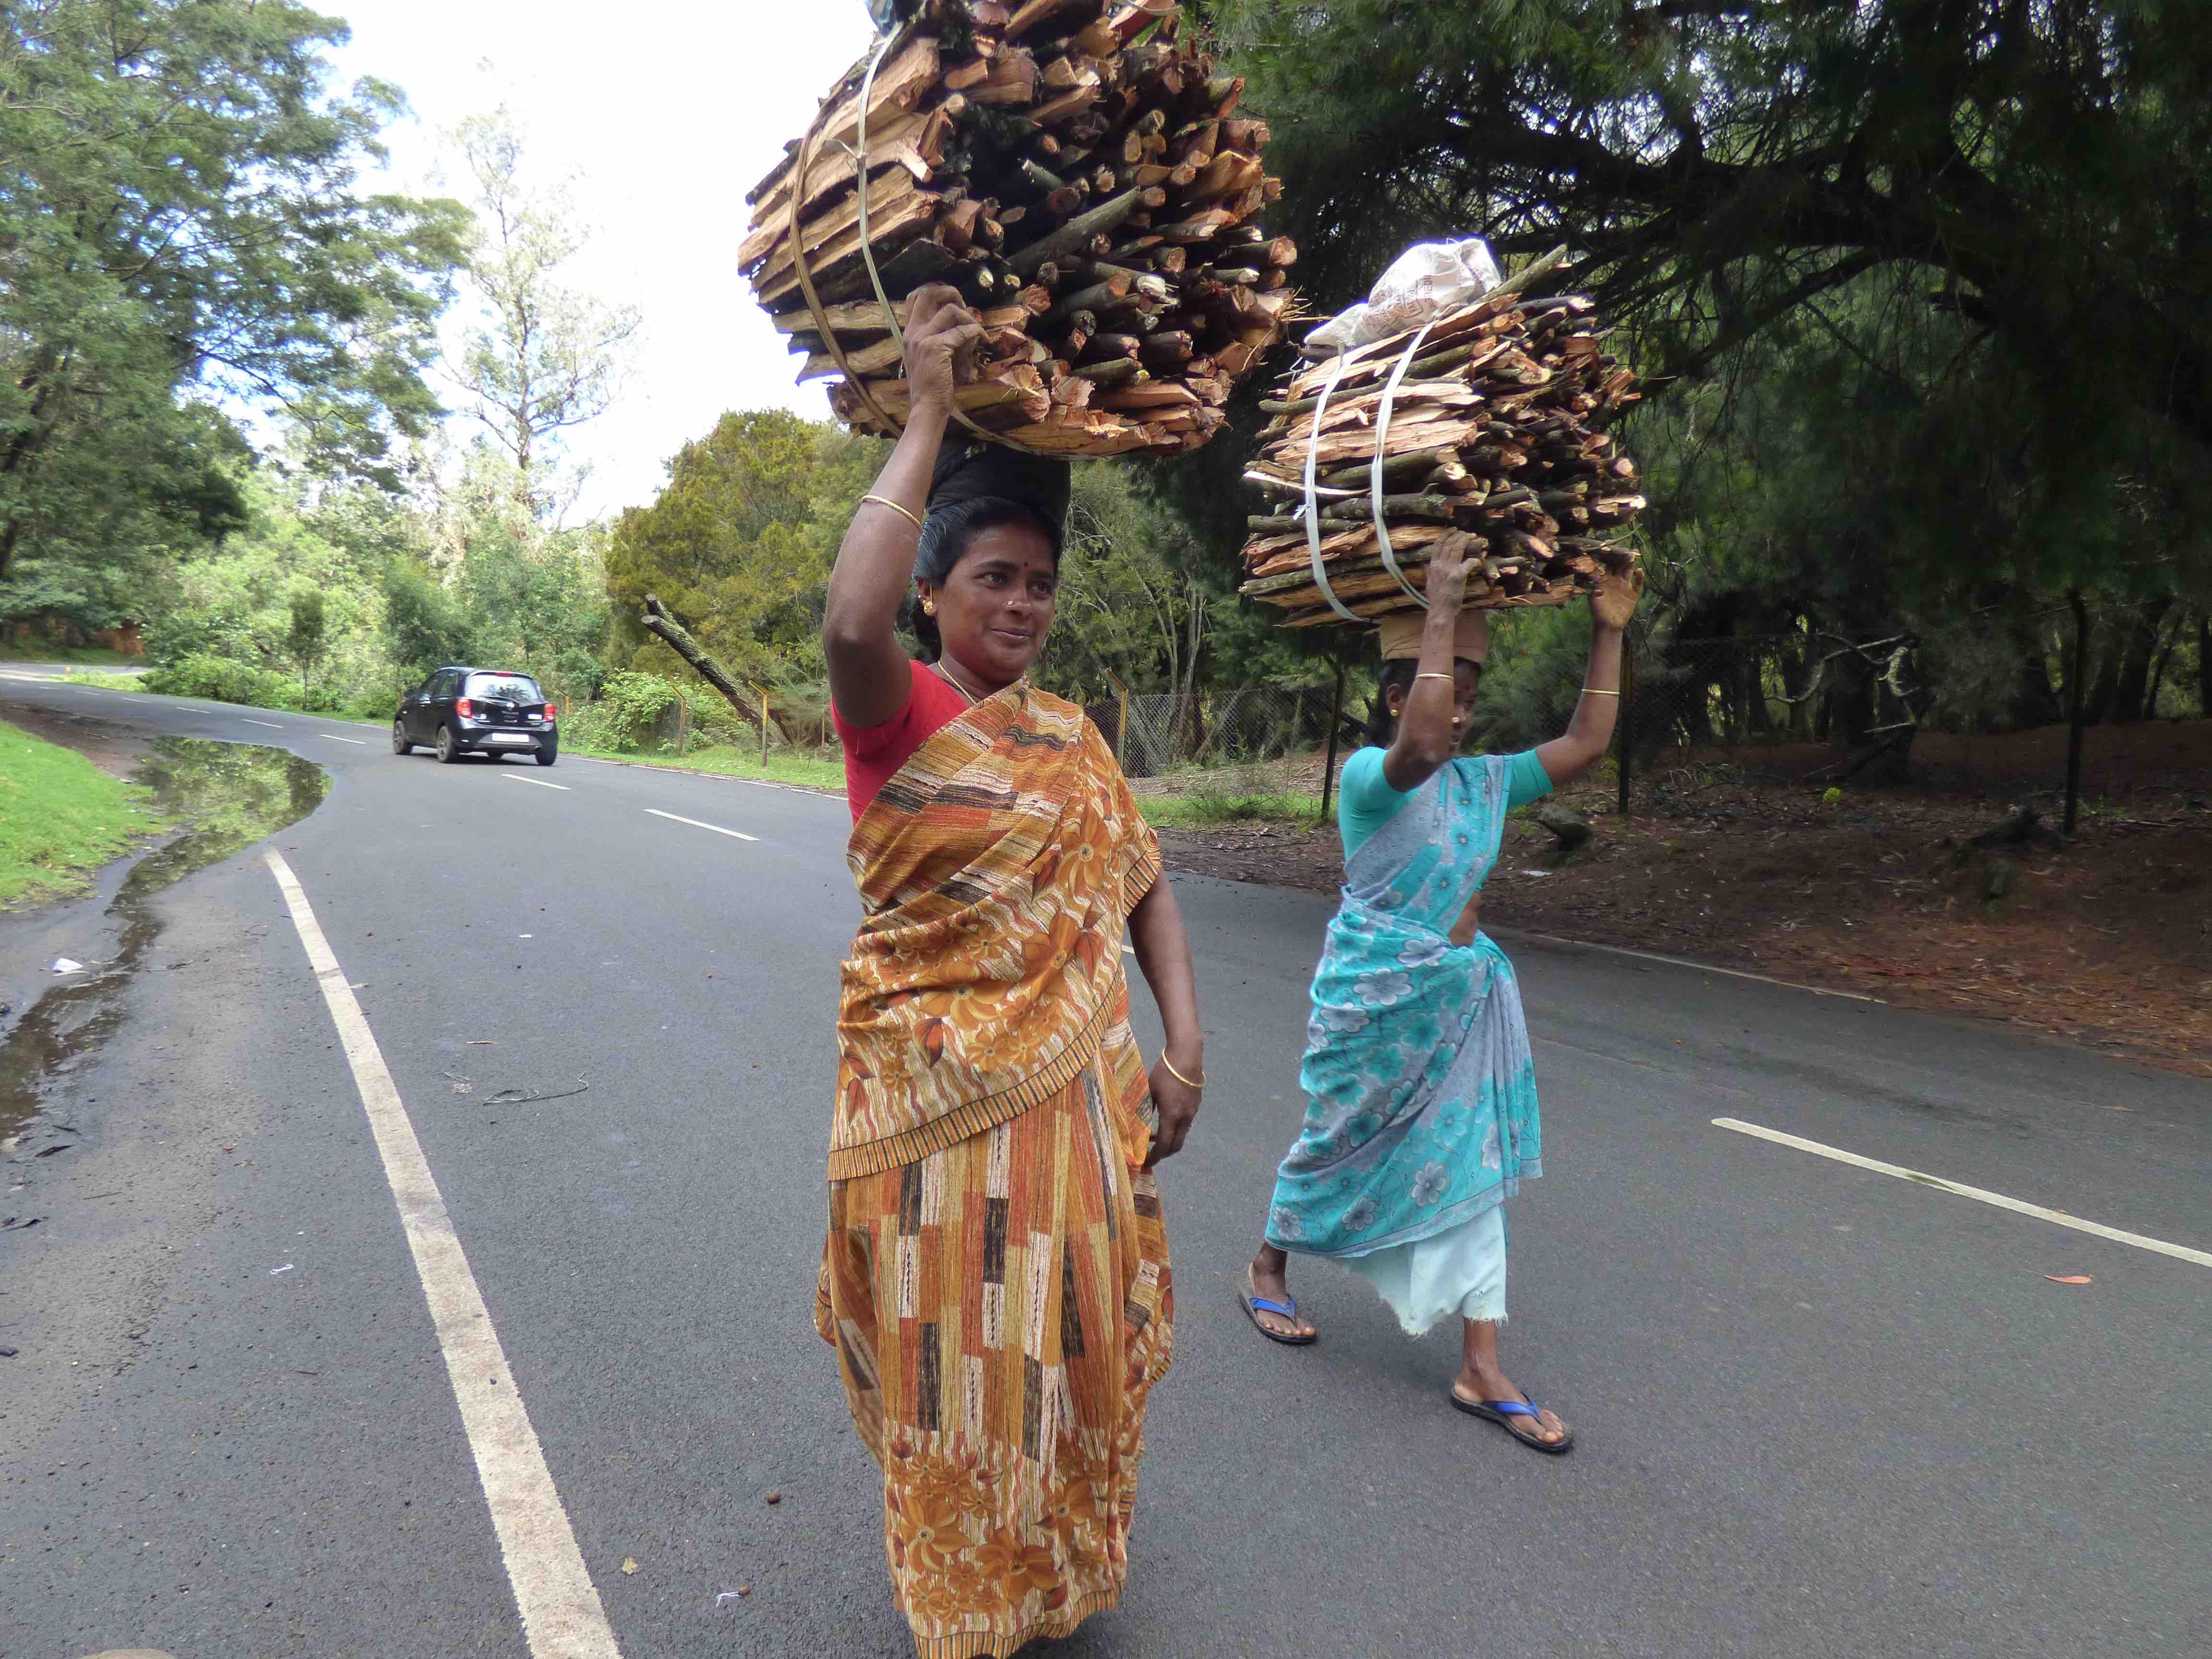 Women carrying headloads of firewood. Credit: Janaki Lenin